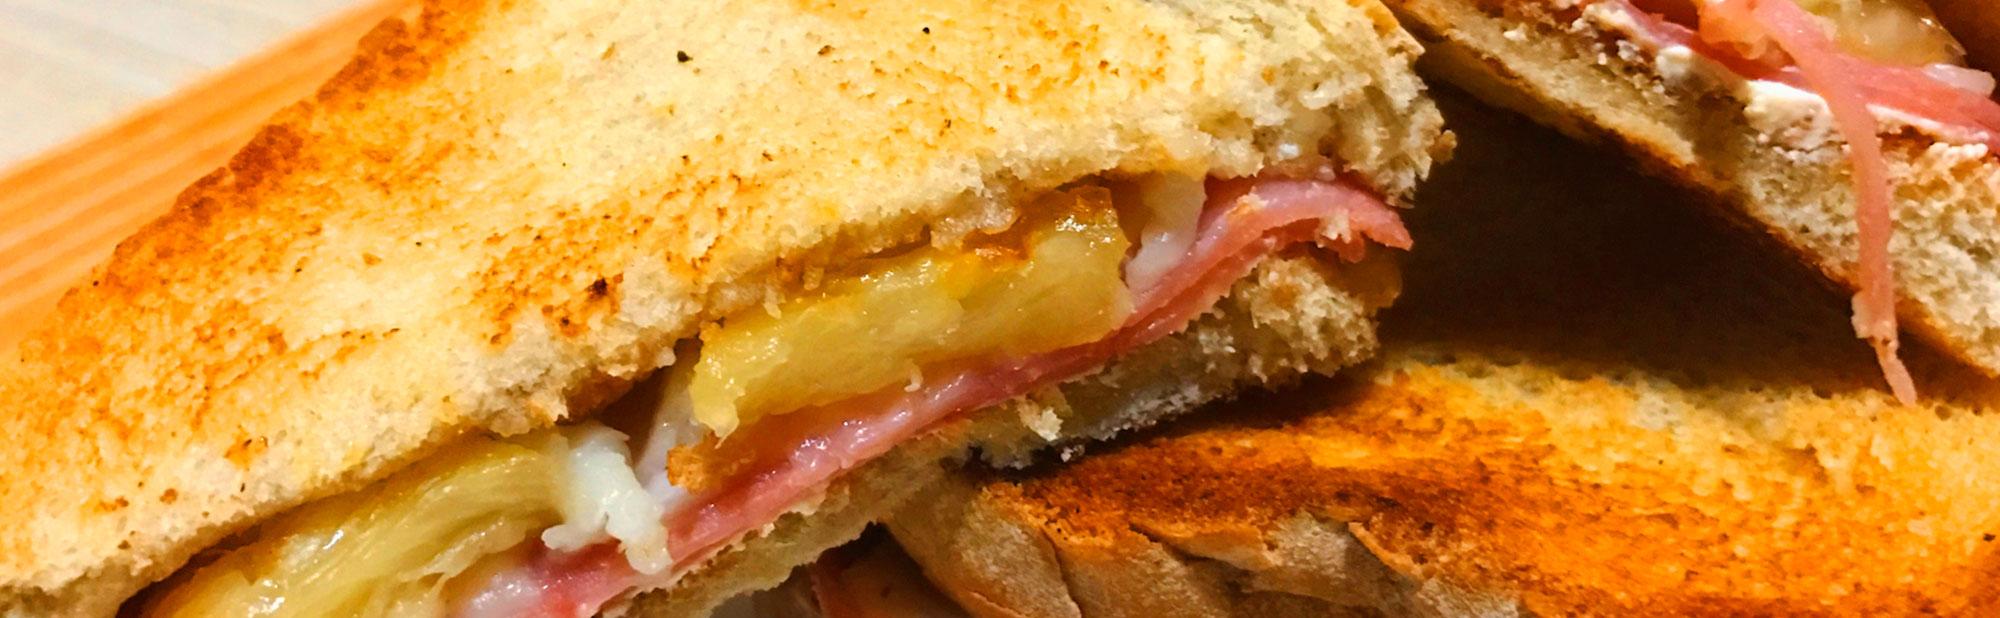 La Antojadera | Sandwich Hawaiano